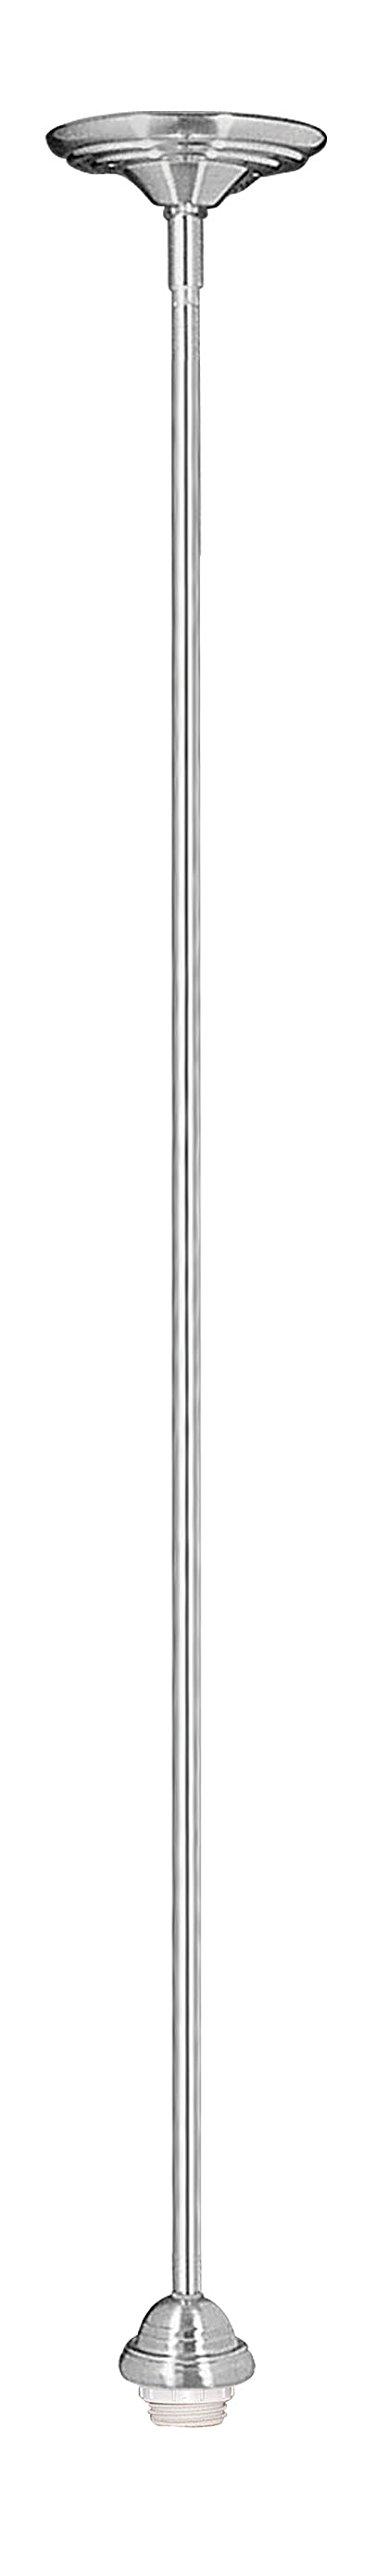 Livex Lighting 5612-91 Mini Pendants 1 Light Pendant, Brushed Nickel